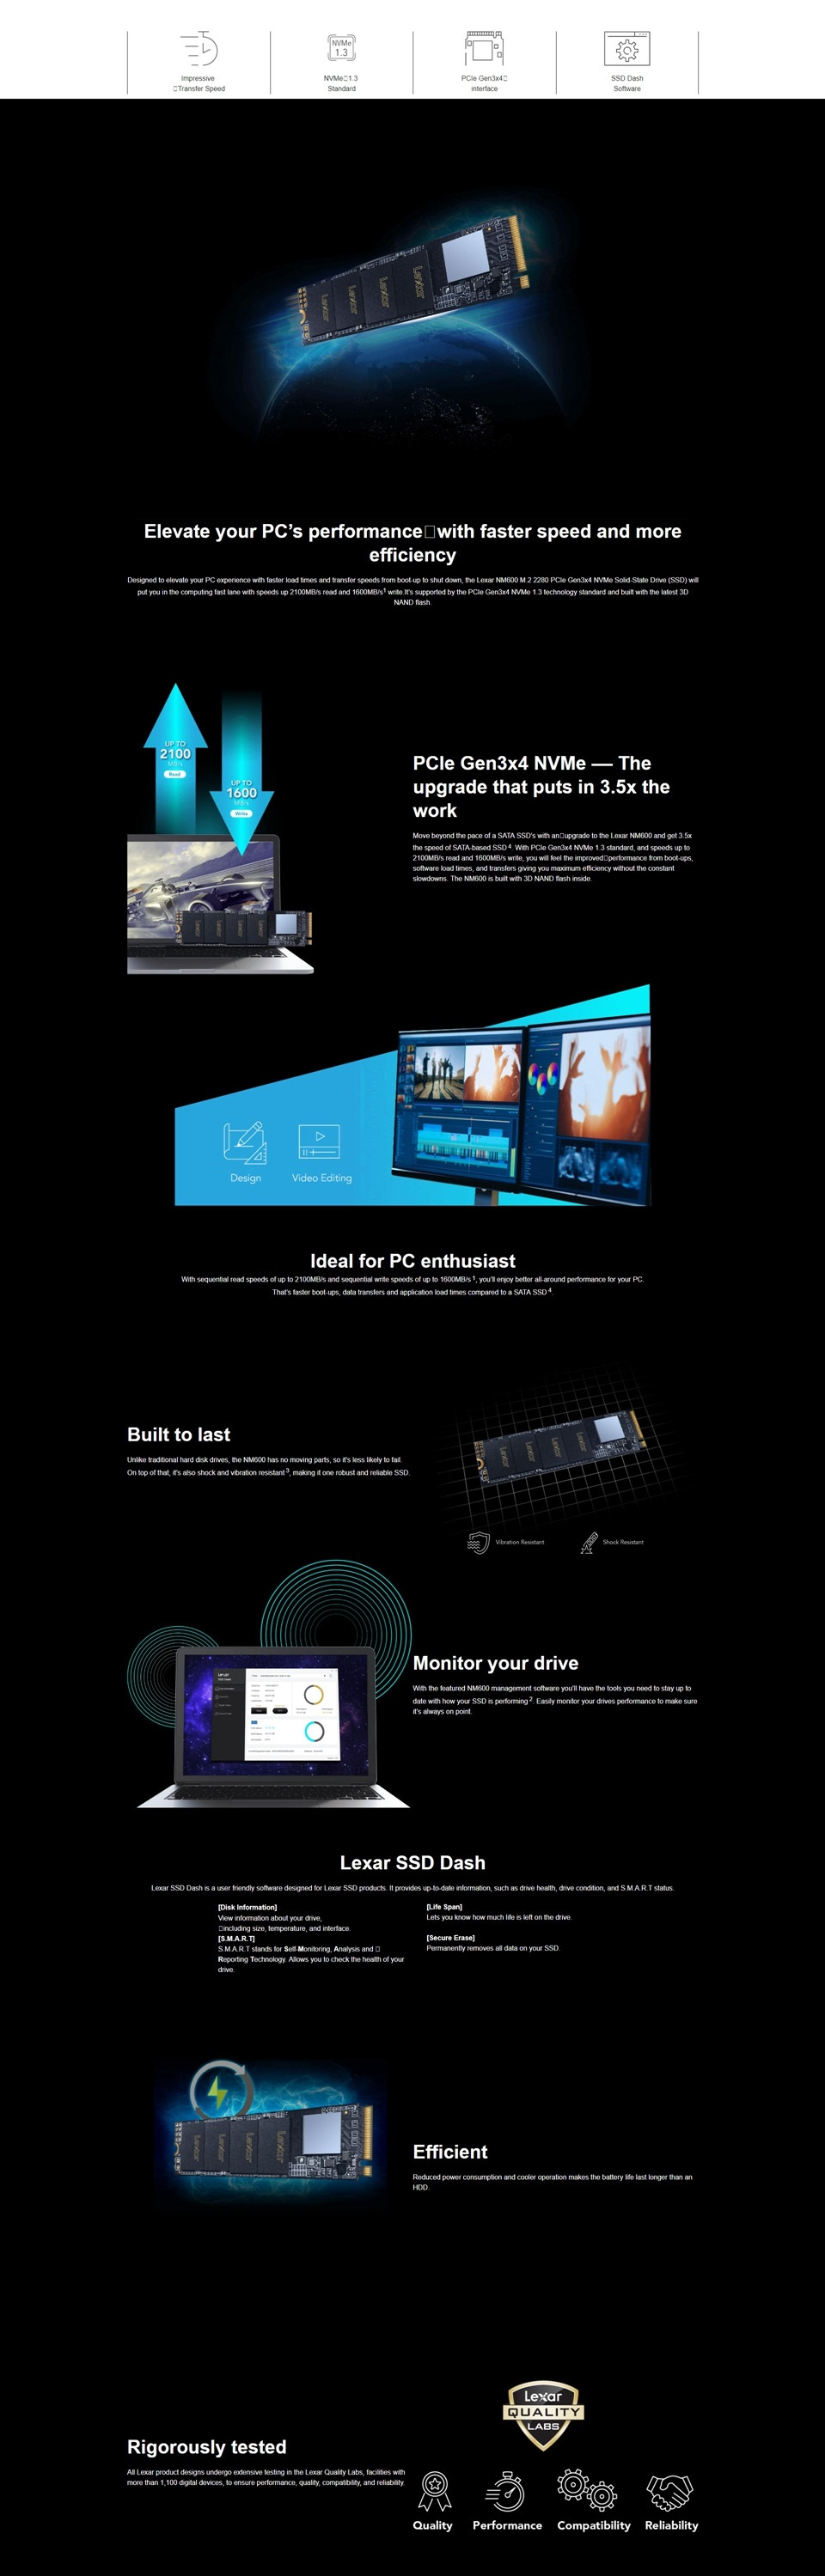 Lexar 480GB NM600 M.2 2280 NVMe PCIE SSD Solid State Drive 2100MB/1600MB R/W